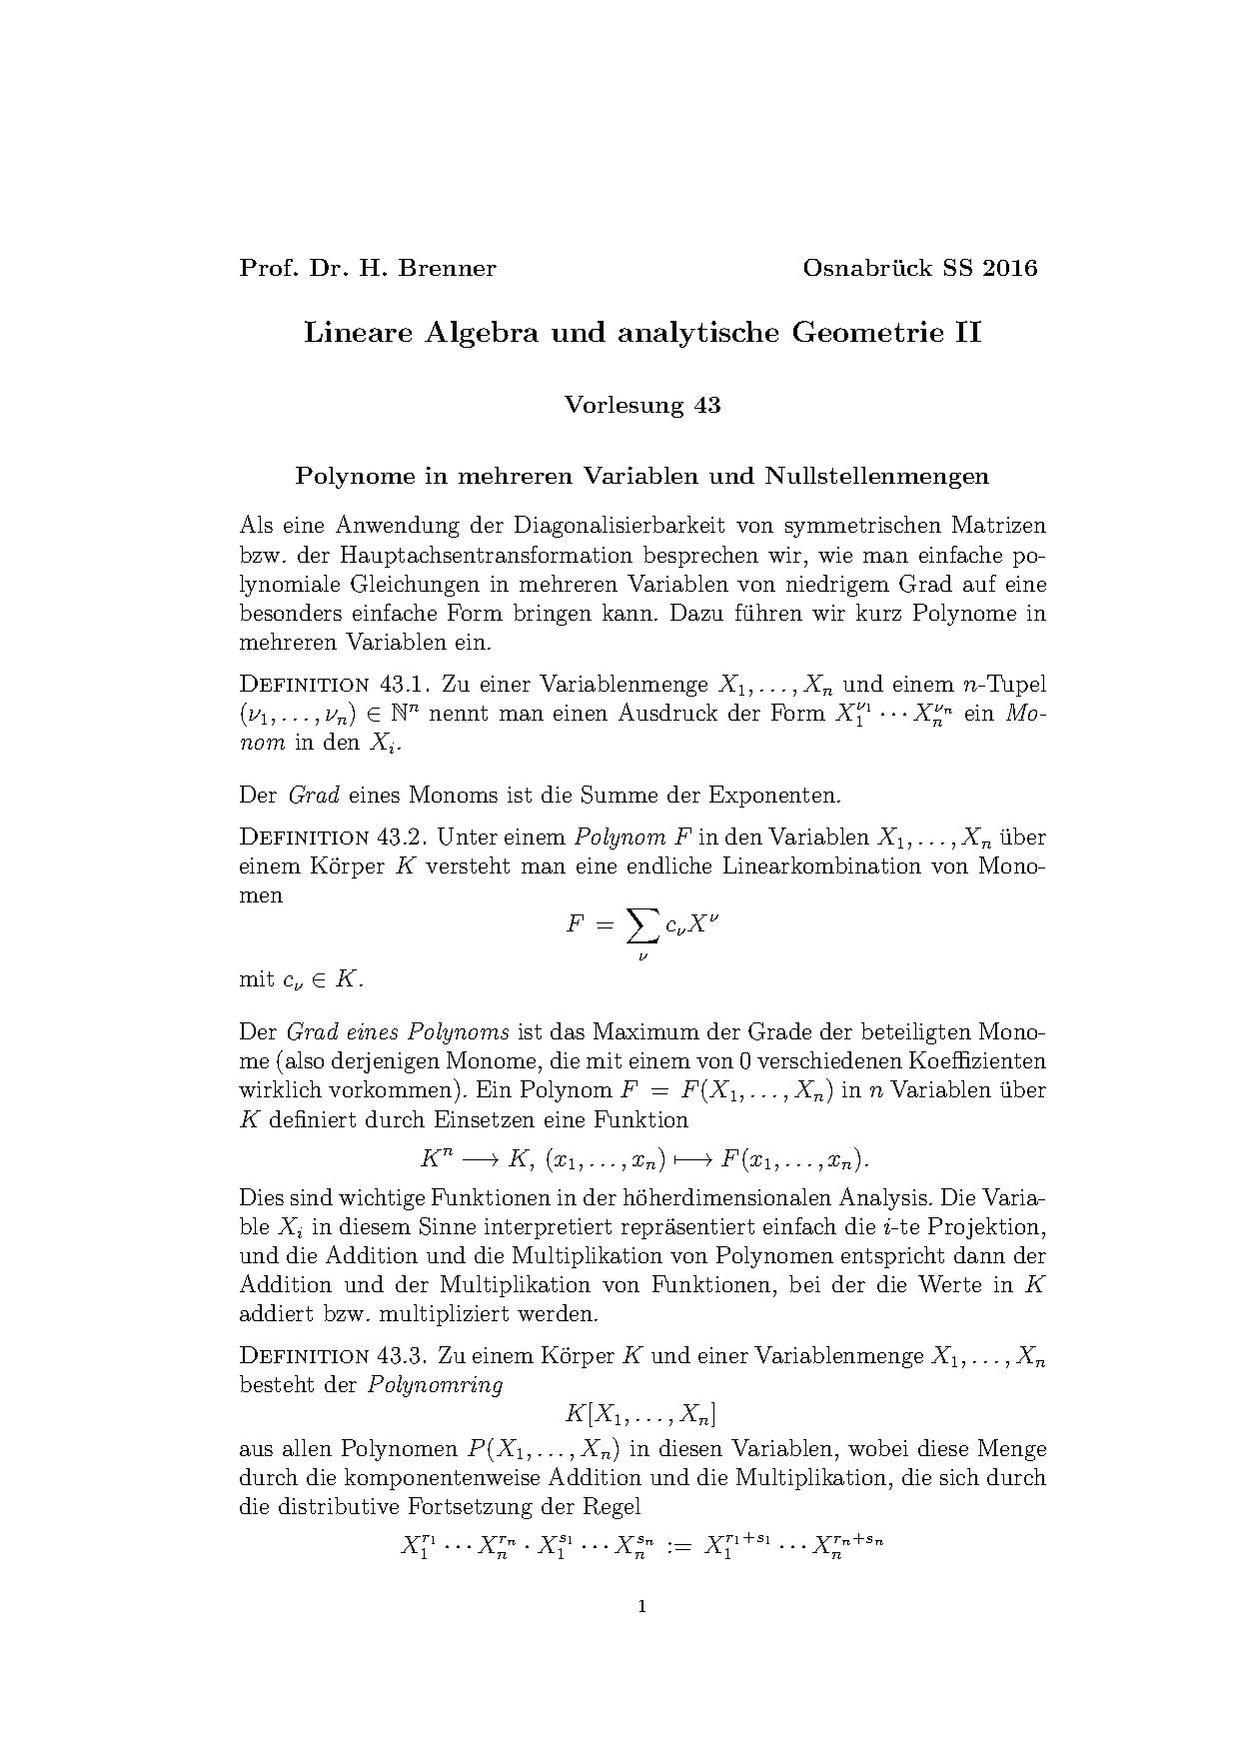 Fancy Einfache Algebra Arbeitsblatt Mold - Kindergarten Arbeitsblatt ...